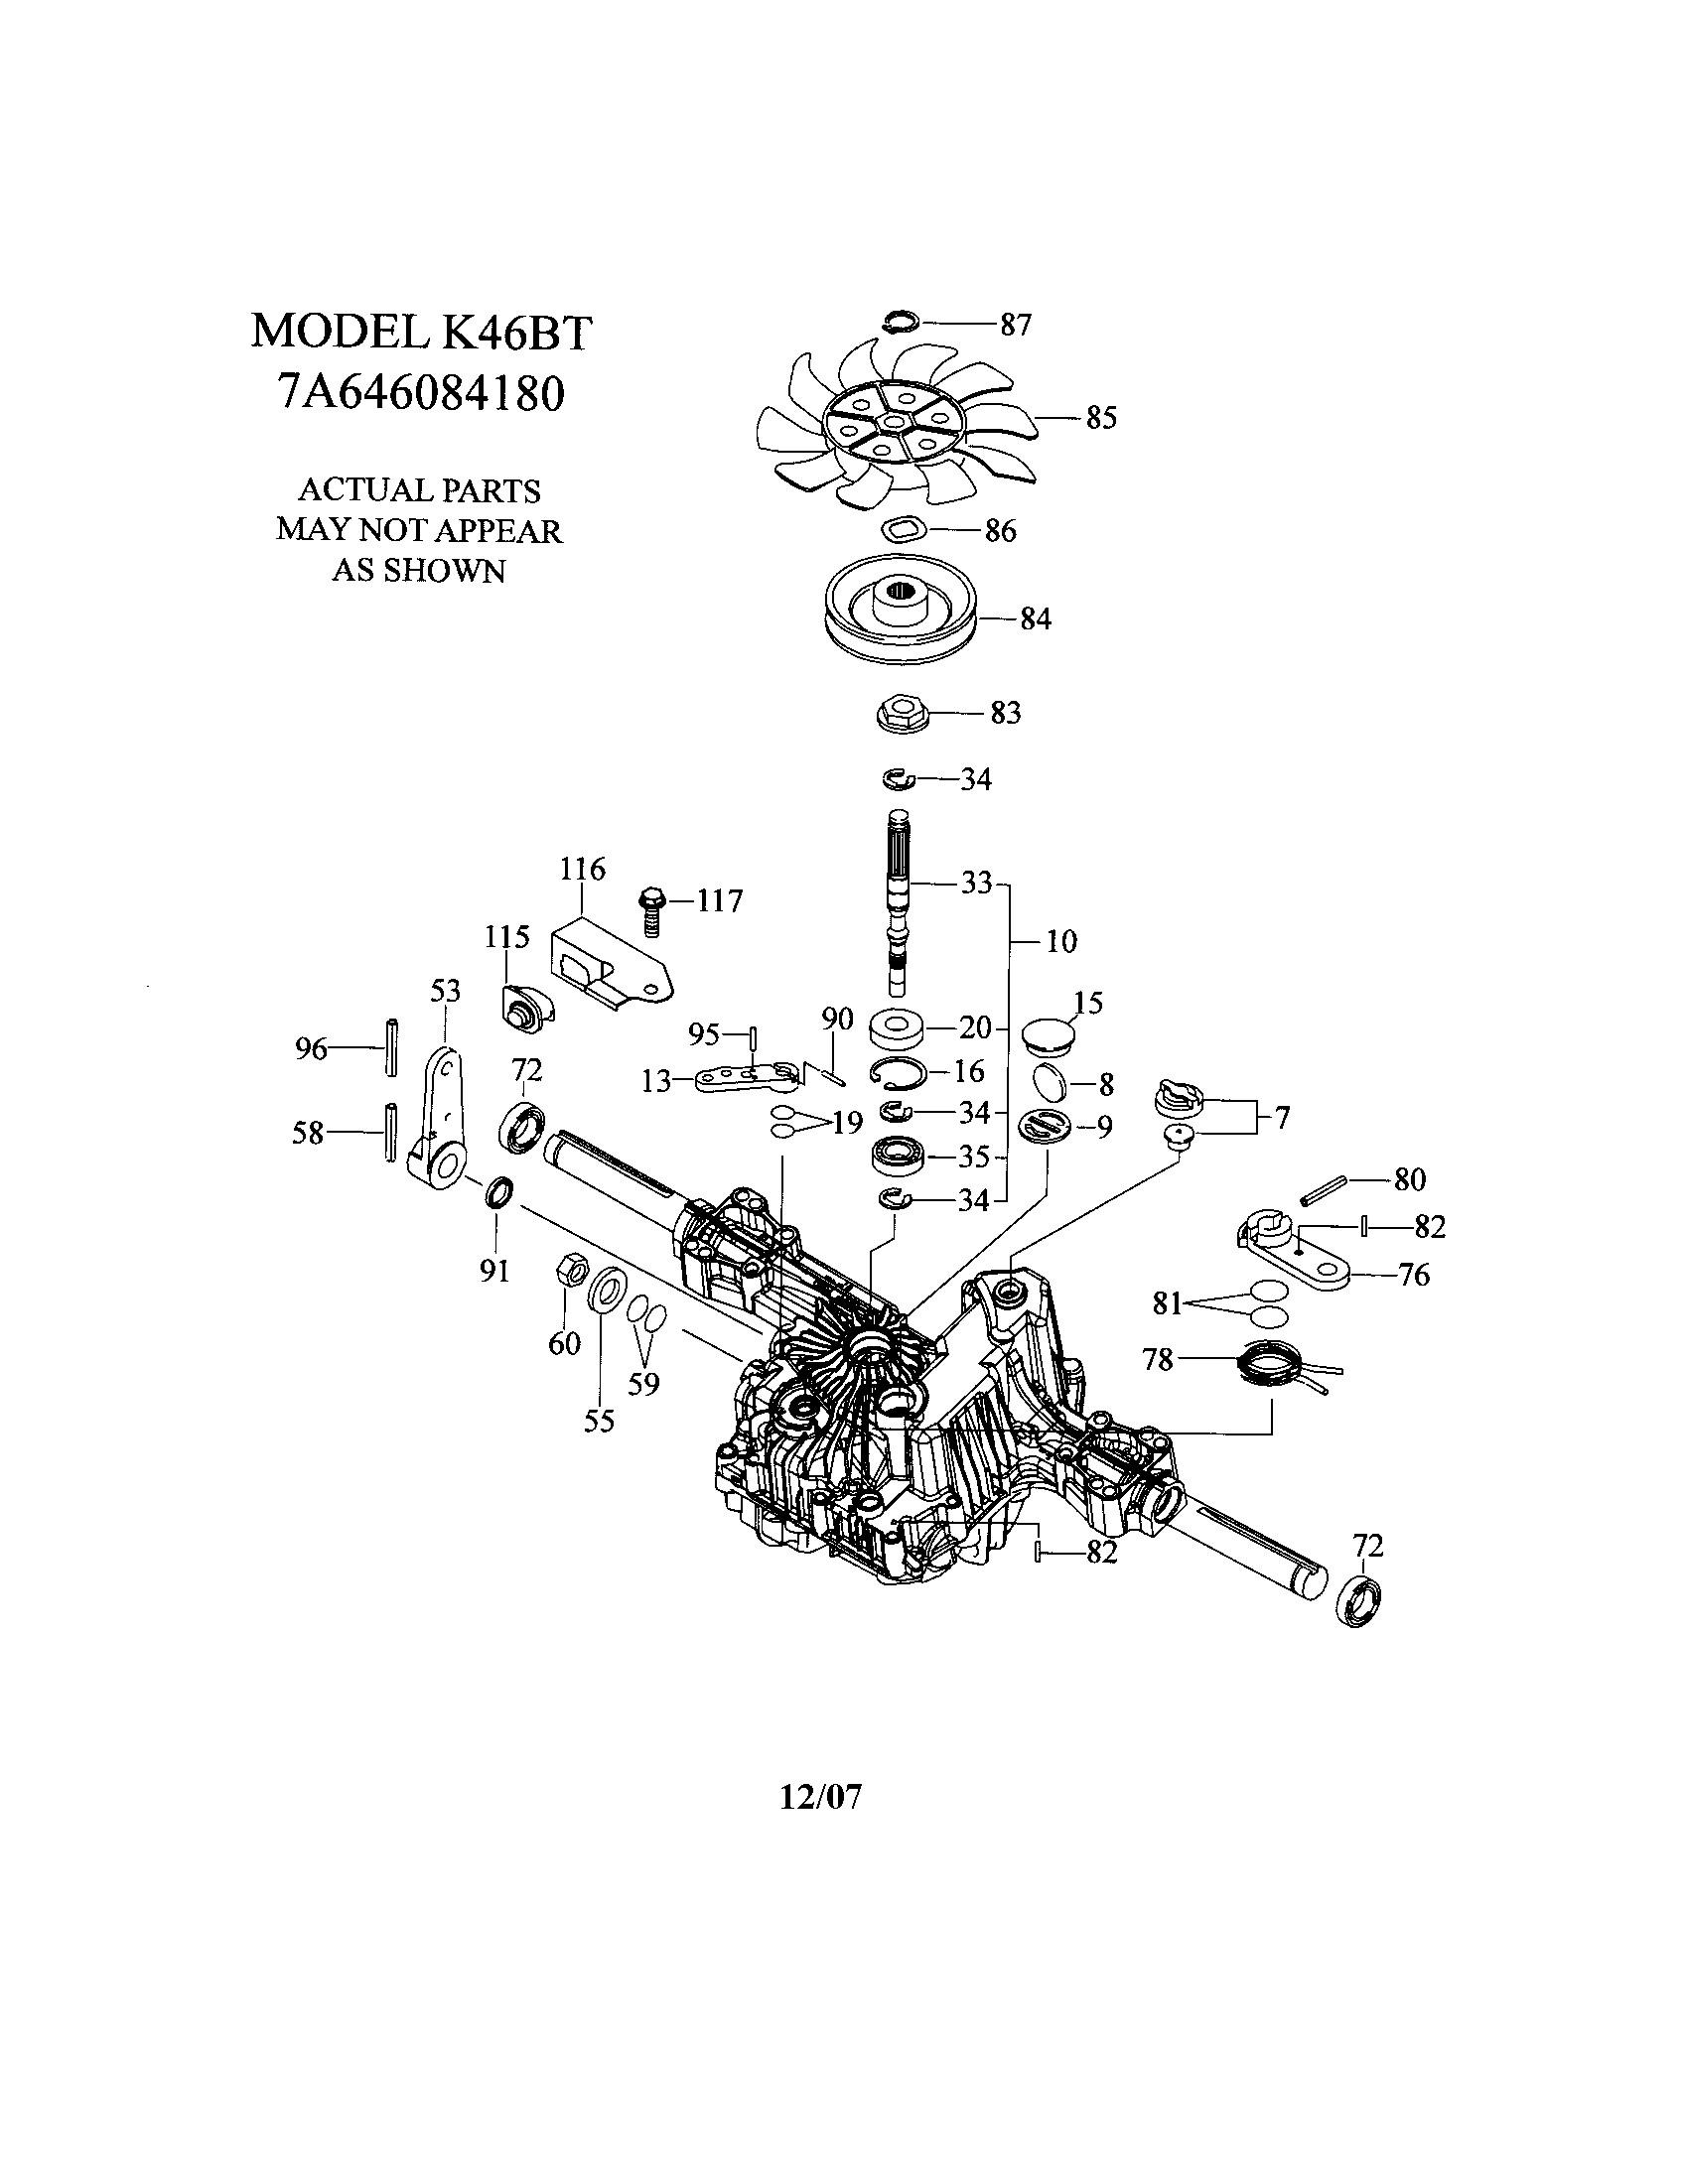 Craftsman Lawn Mower Engine Parts Diagram Craftsman Lawn Parts Model Of Craftsman Lawn Mower Engine Parts Diagram